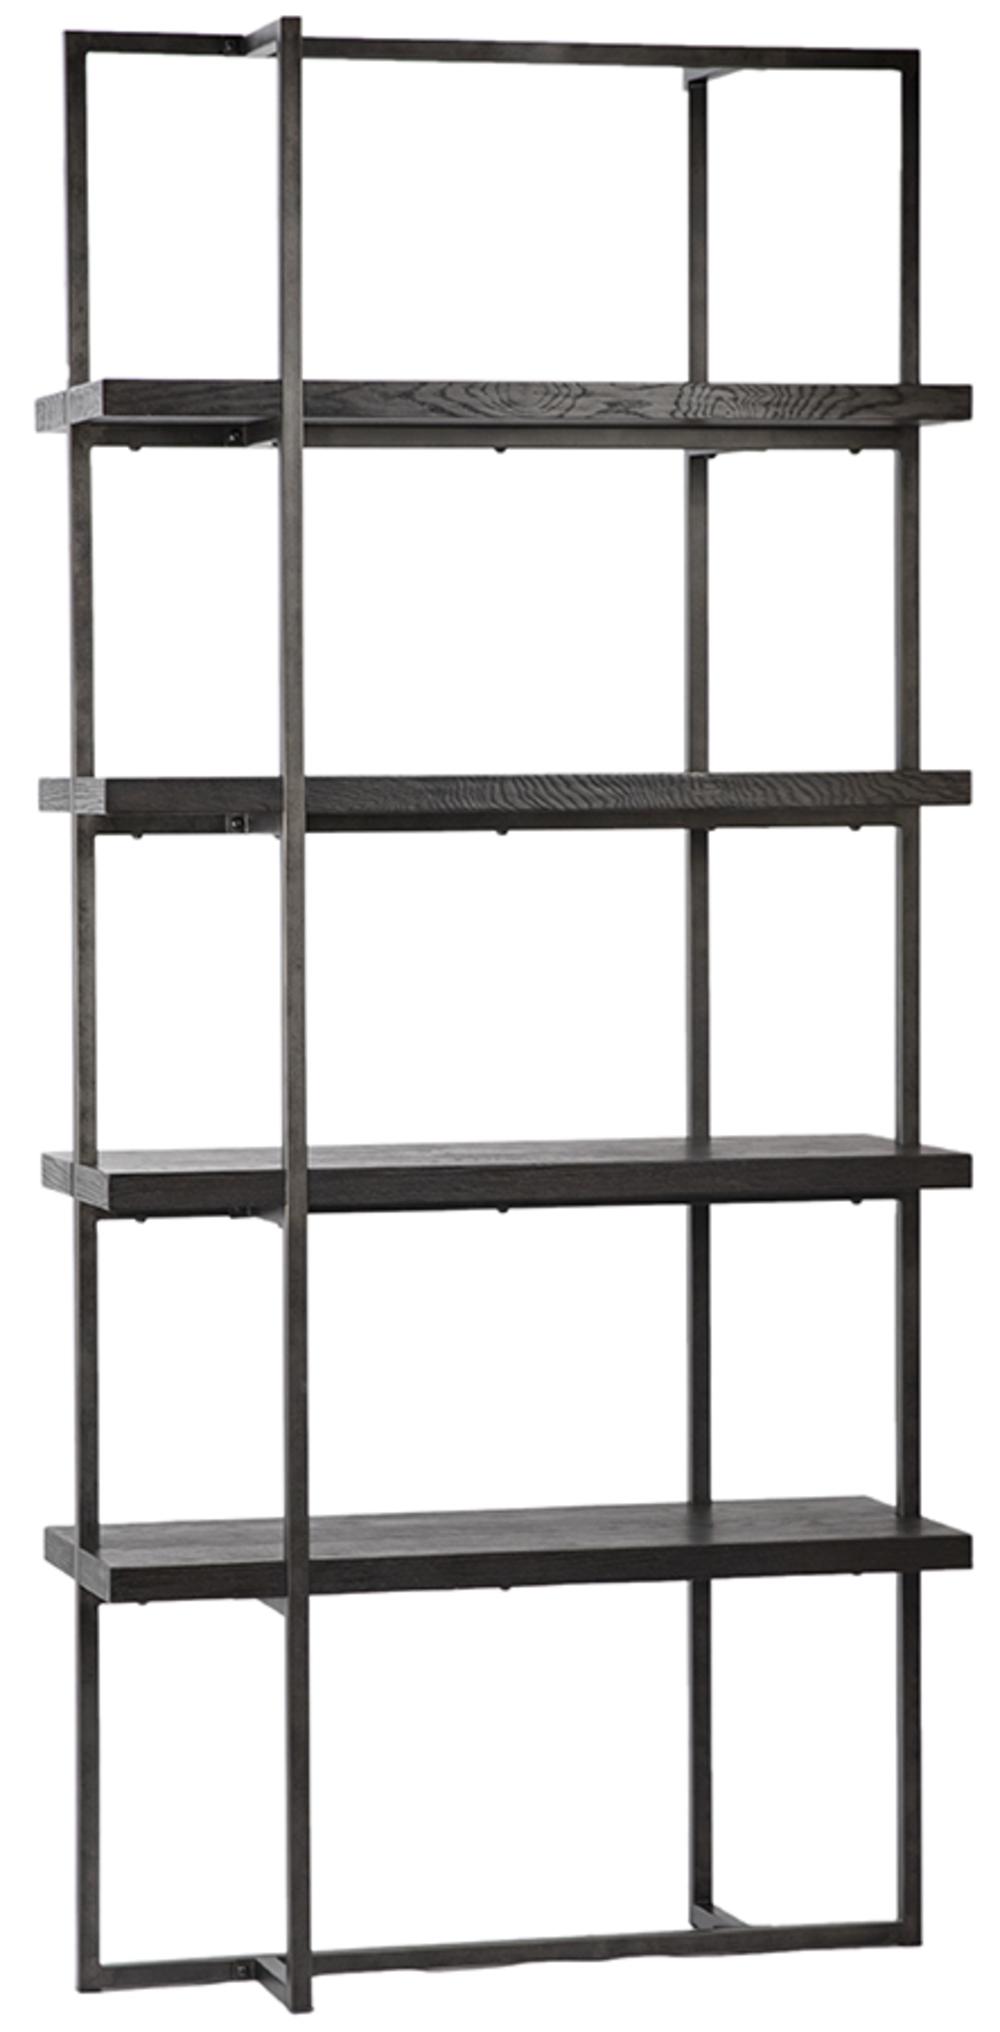 Dovetail Furniture - Belvin Bookcase